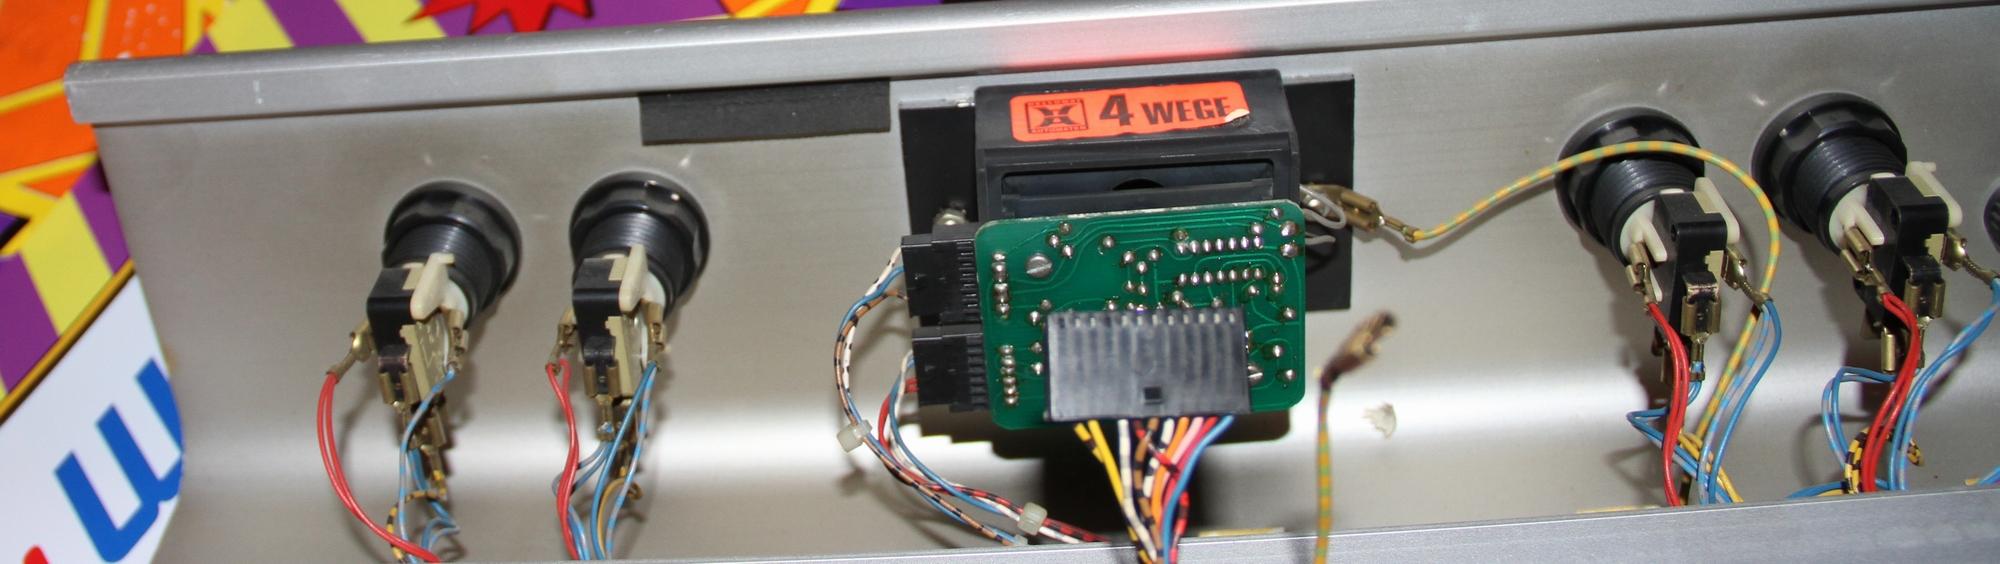 Üble Joystick Verkabelung - Arcade - Circuit-Board